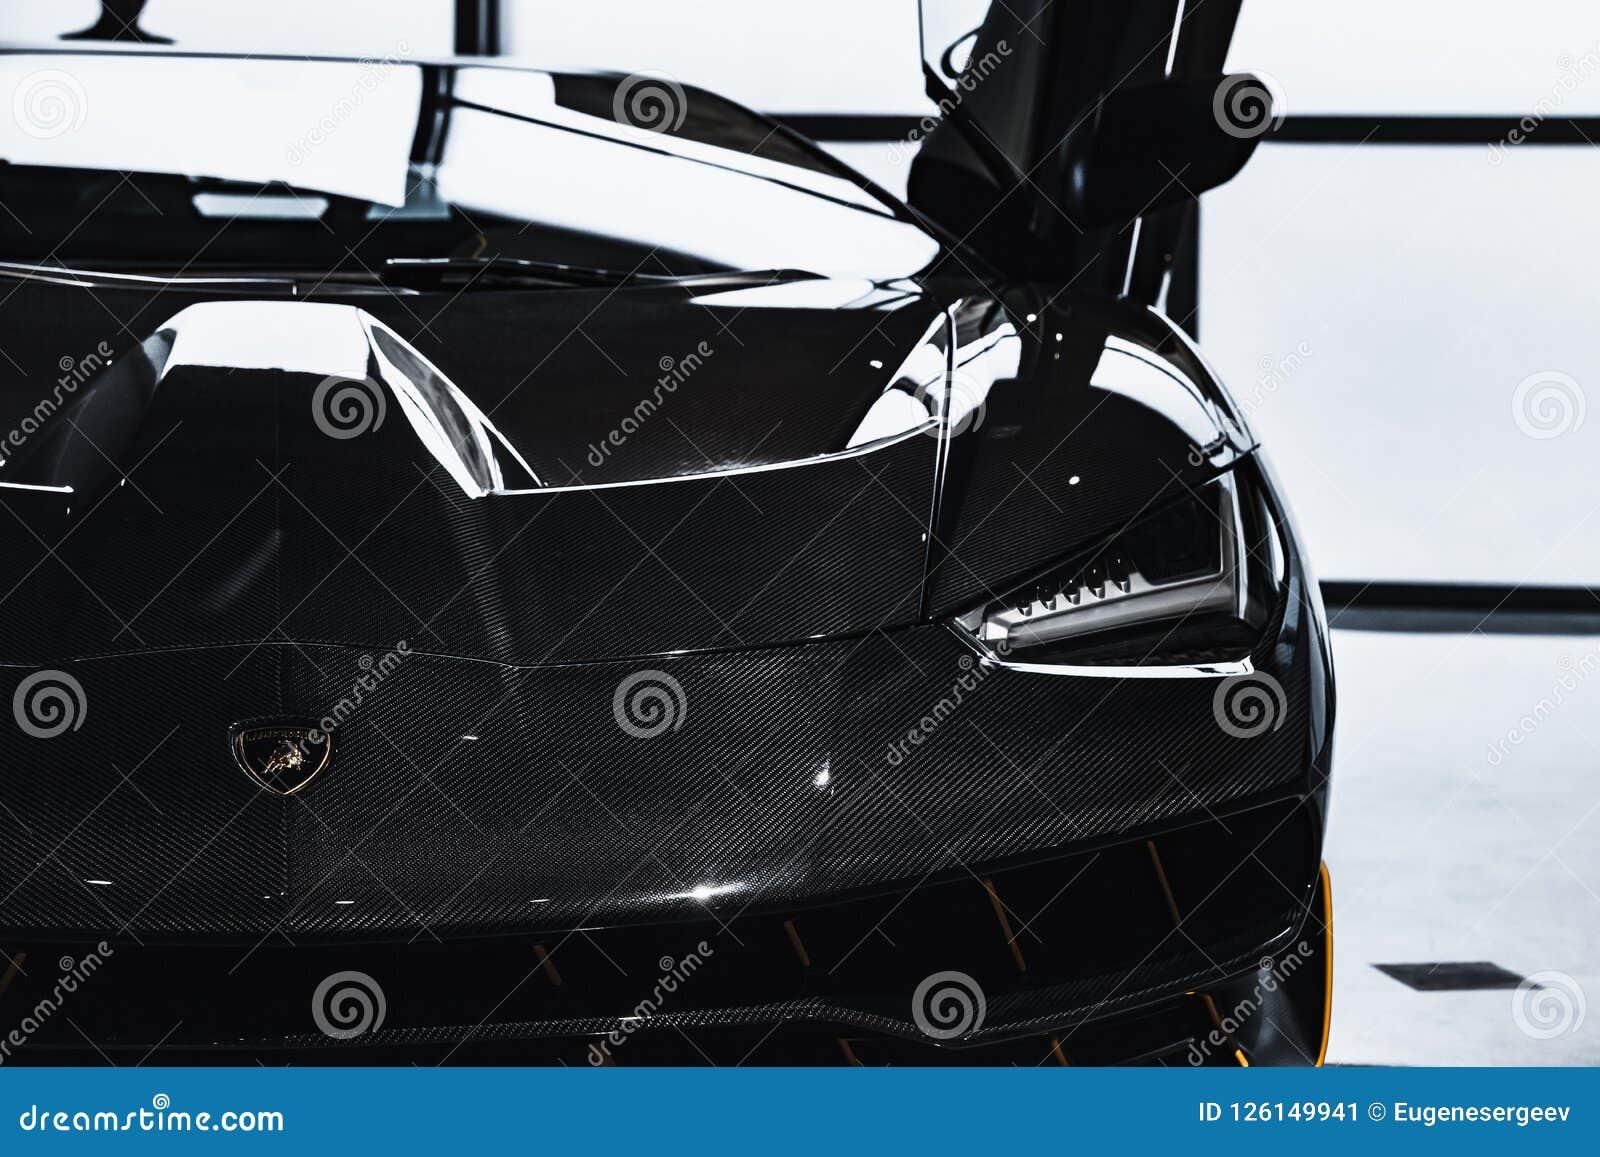 Shiny Black Lamborghini Centenario Car Editorial Photo Image Of